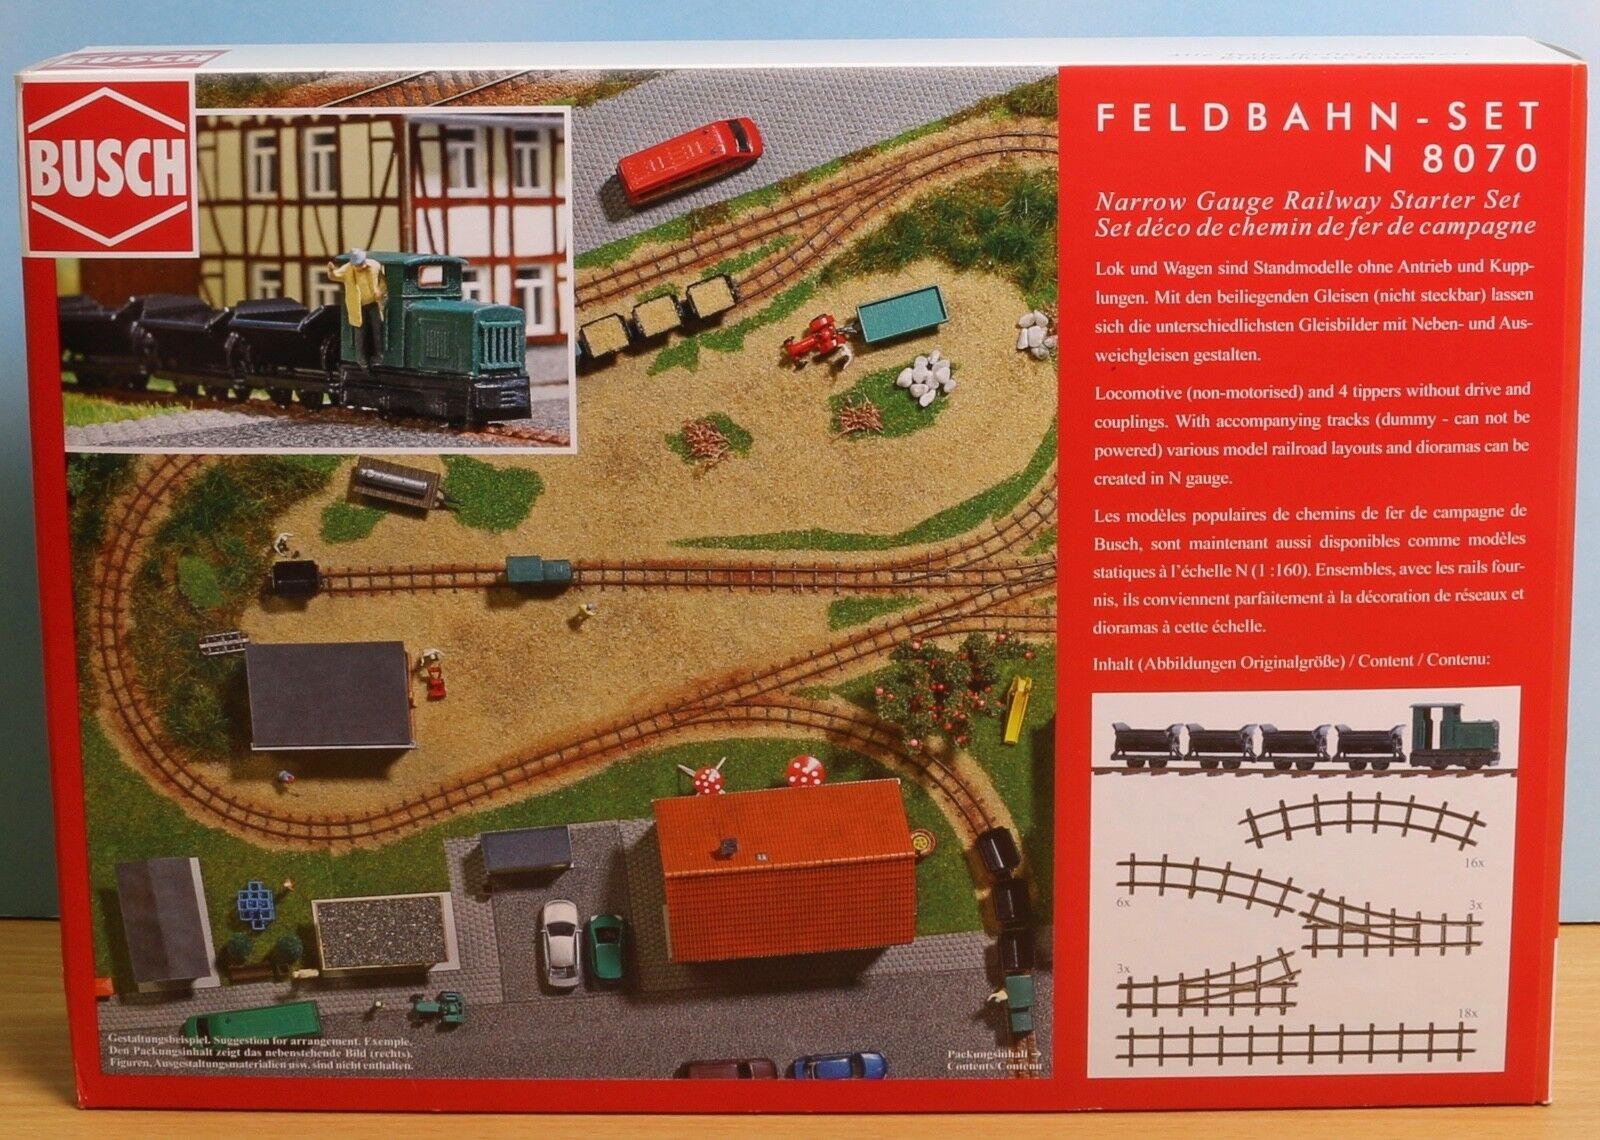 Busch 8070, Spur N, Bausatz Feldbahn-Set (Kunststoff) ohne Antrieb, Standmodelle Standmodelle Standmodelle 86bf06